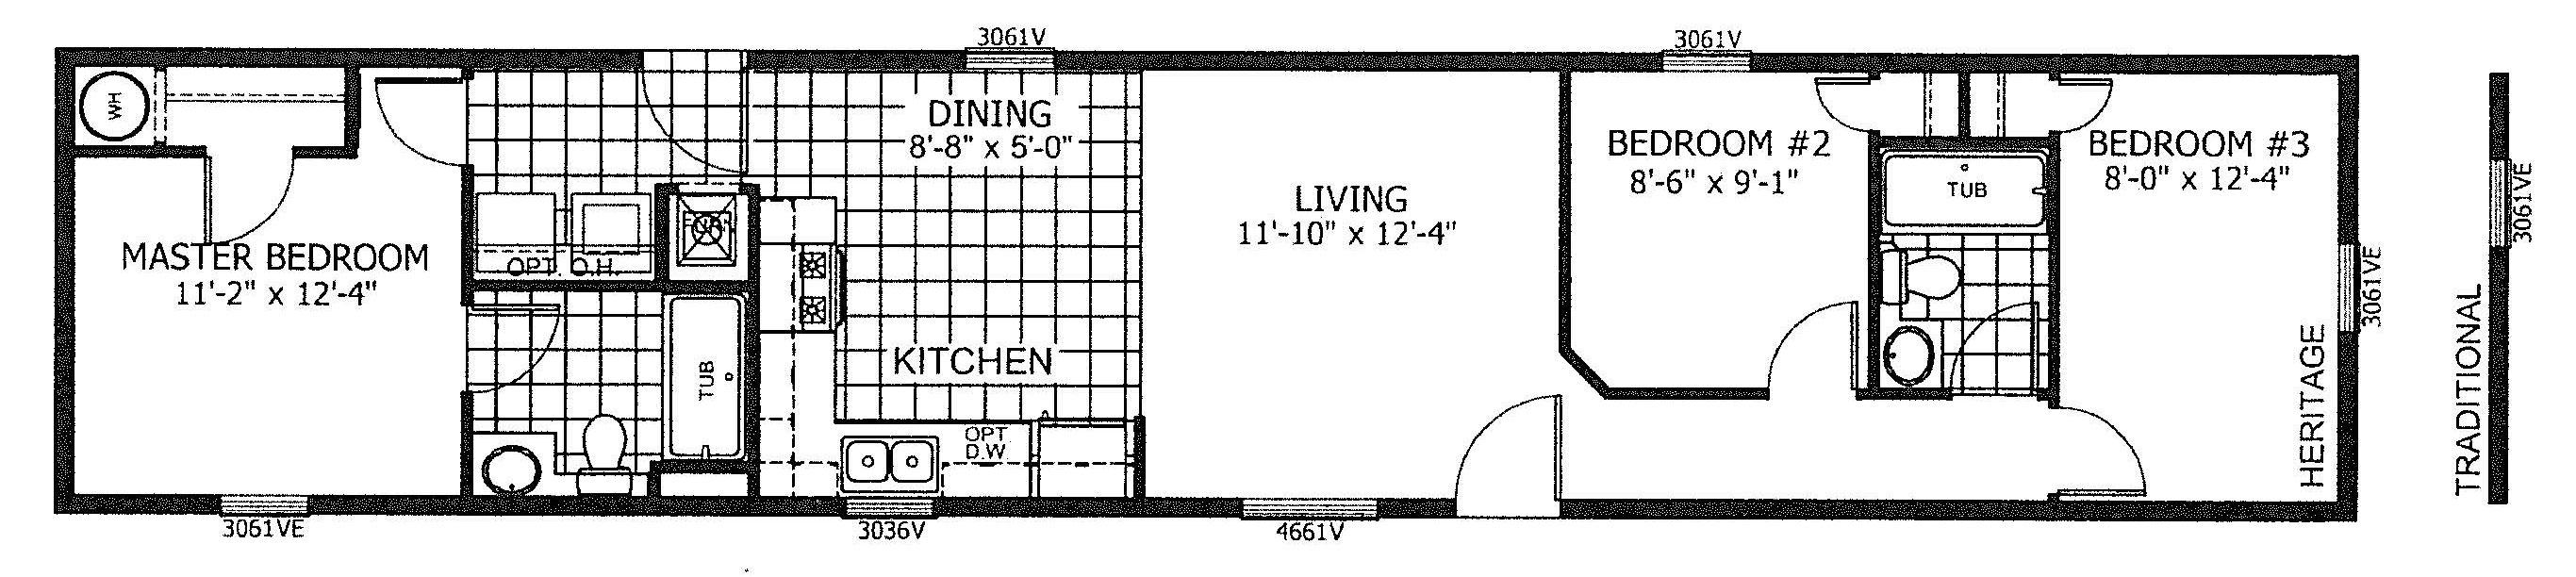 Floorplan of Model 19-7997